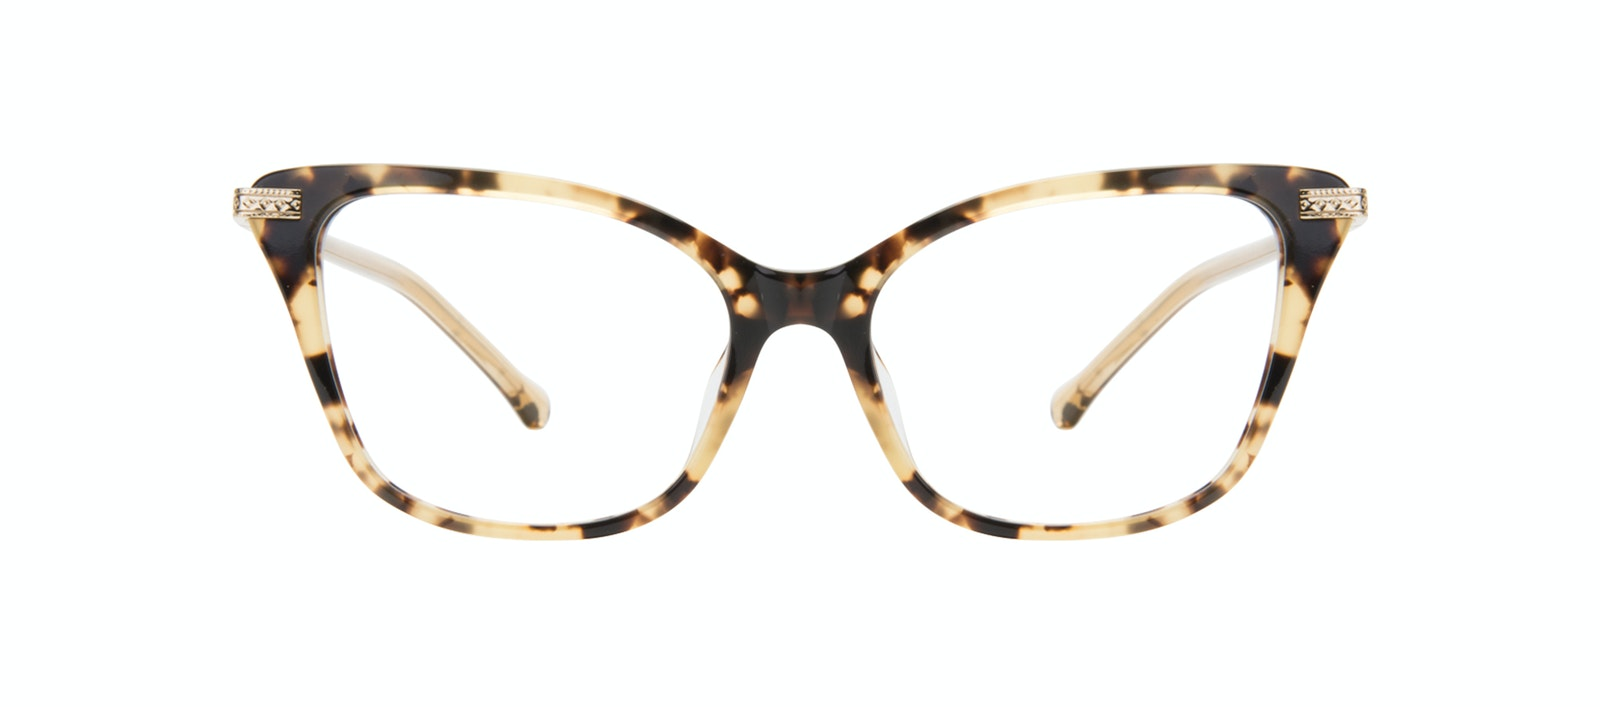 Affordable Fashion Glasses Cat Eye Eyeglasses Women Stargaze Golden Chip Front